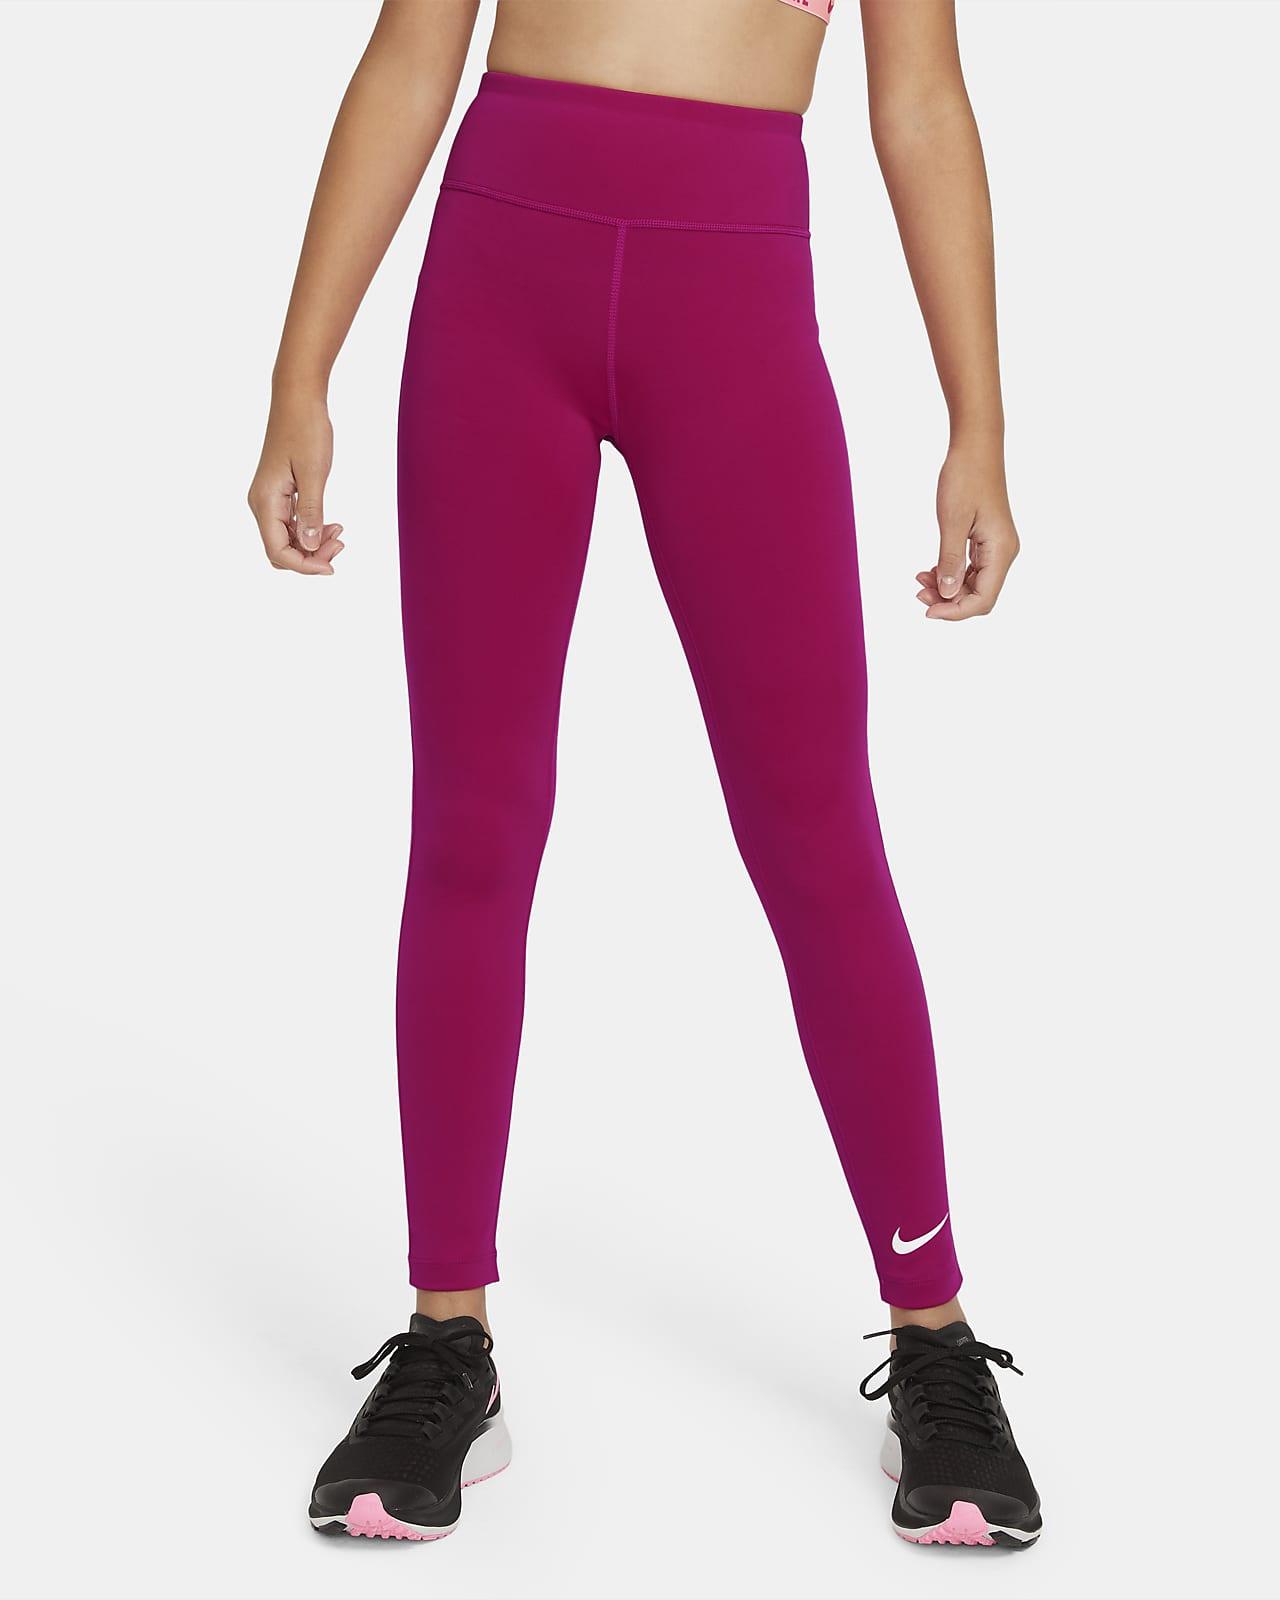 Leggings de entrenamiento para niñas talla grande Nike One